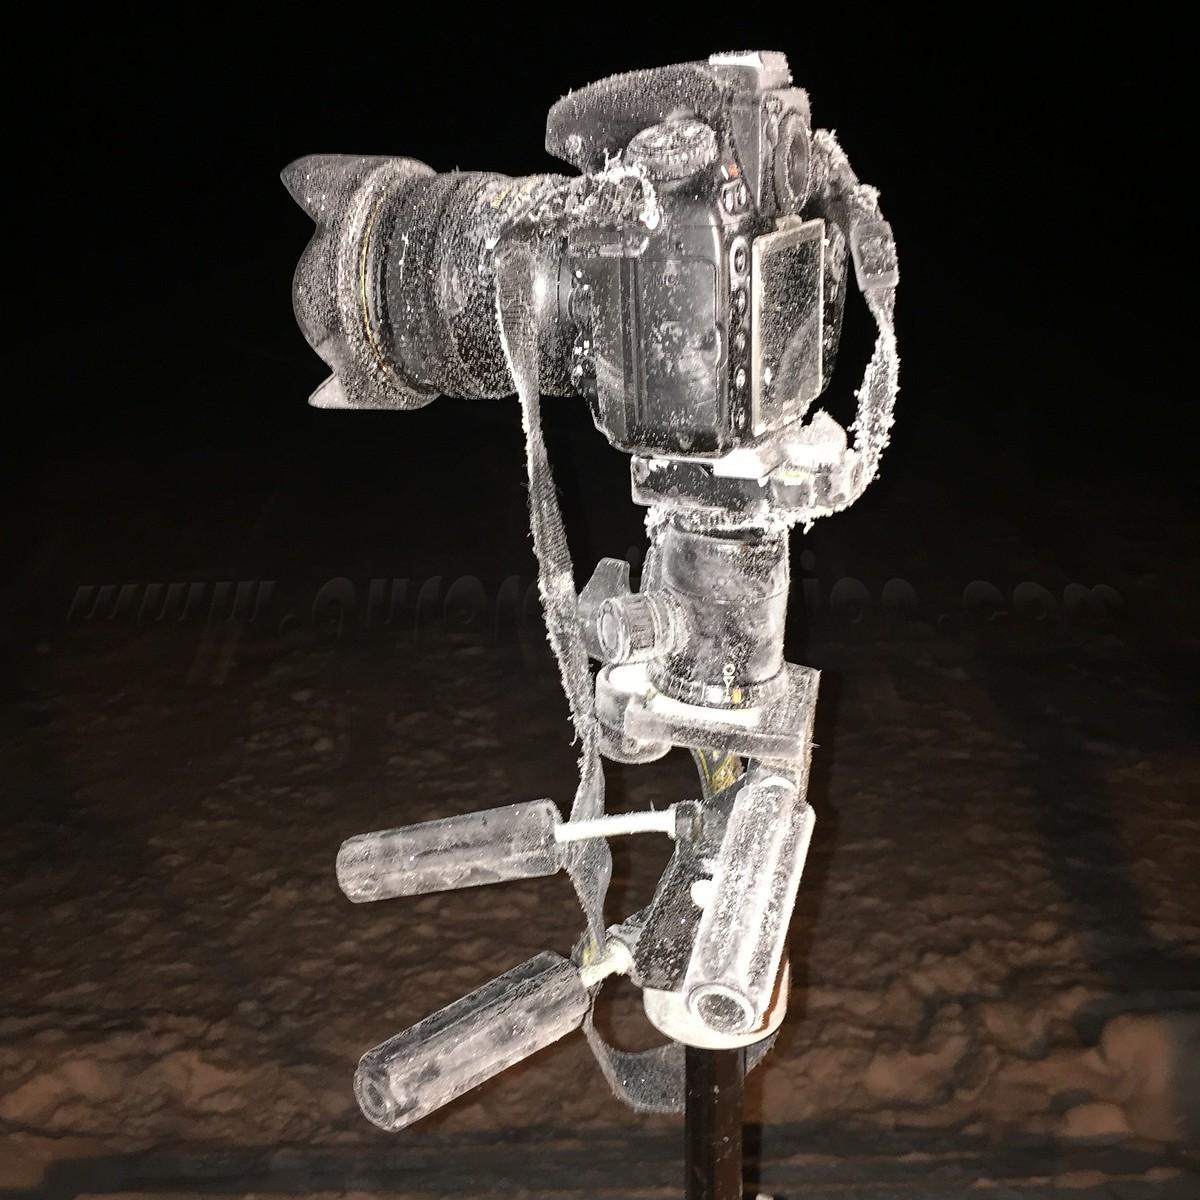 Nikon D800 camera at minus 30°F